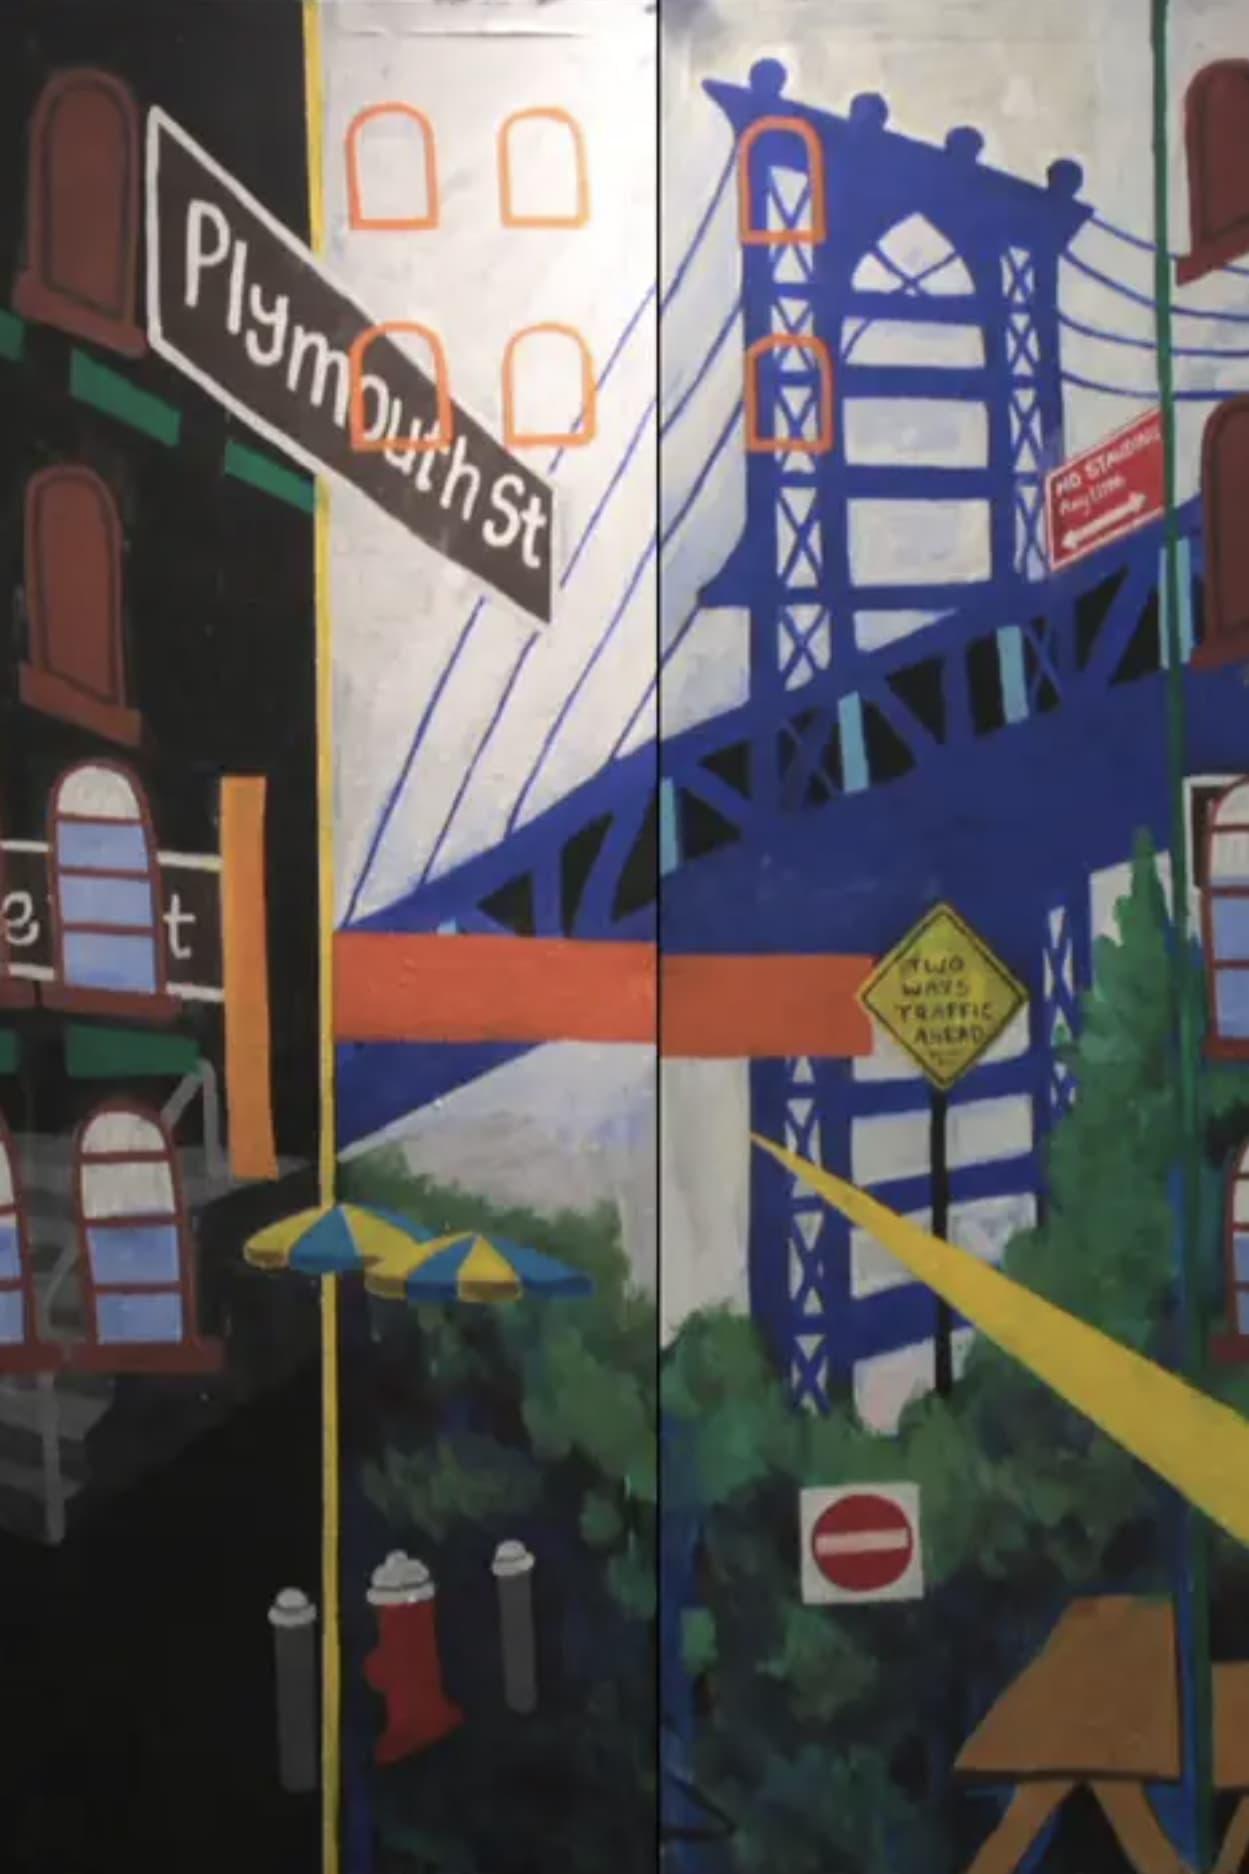 Bridge St